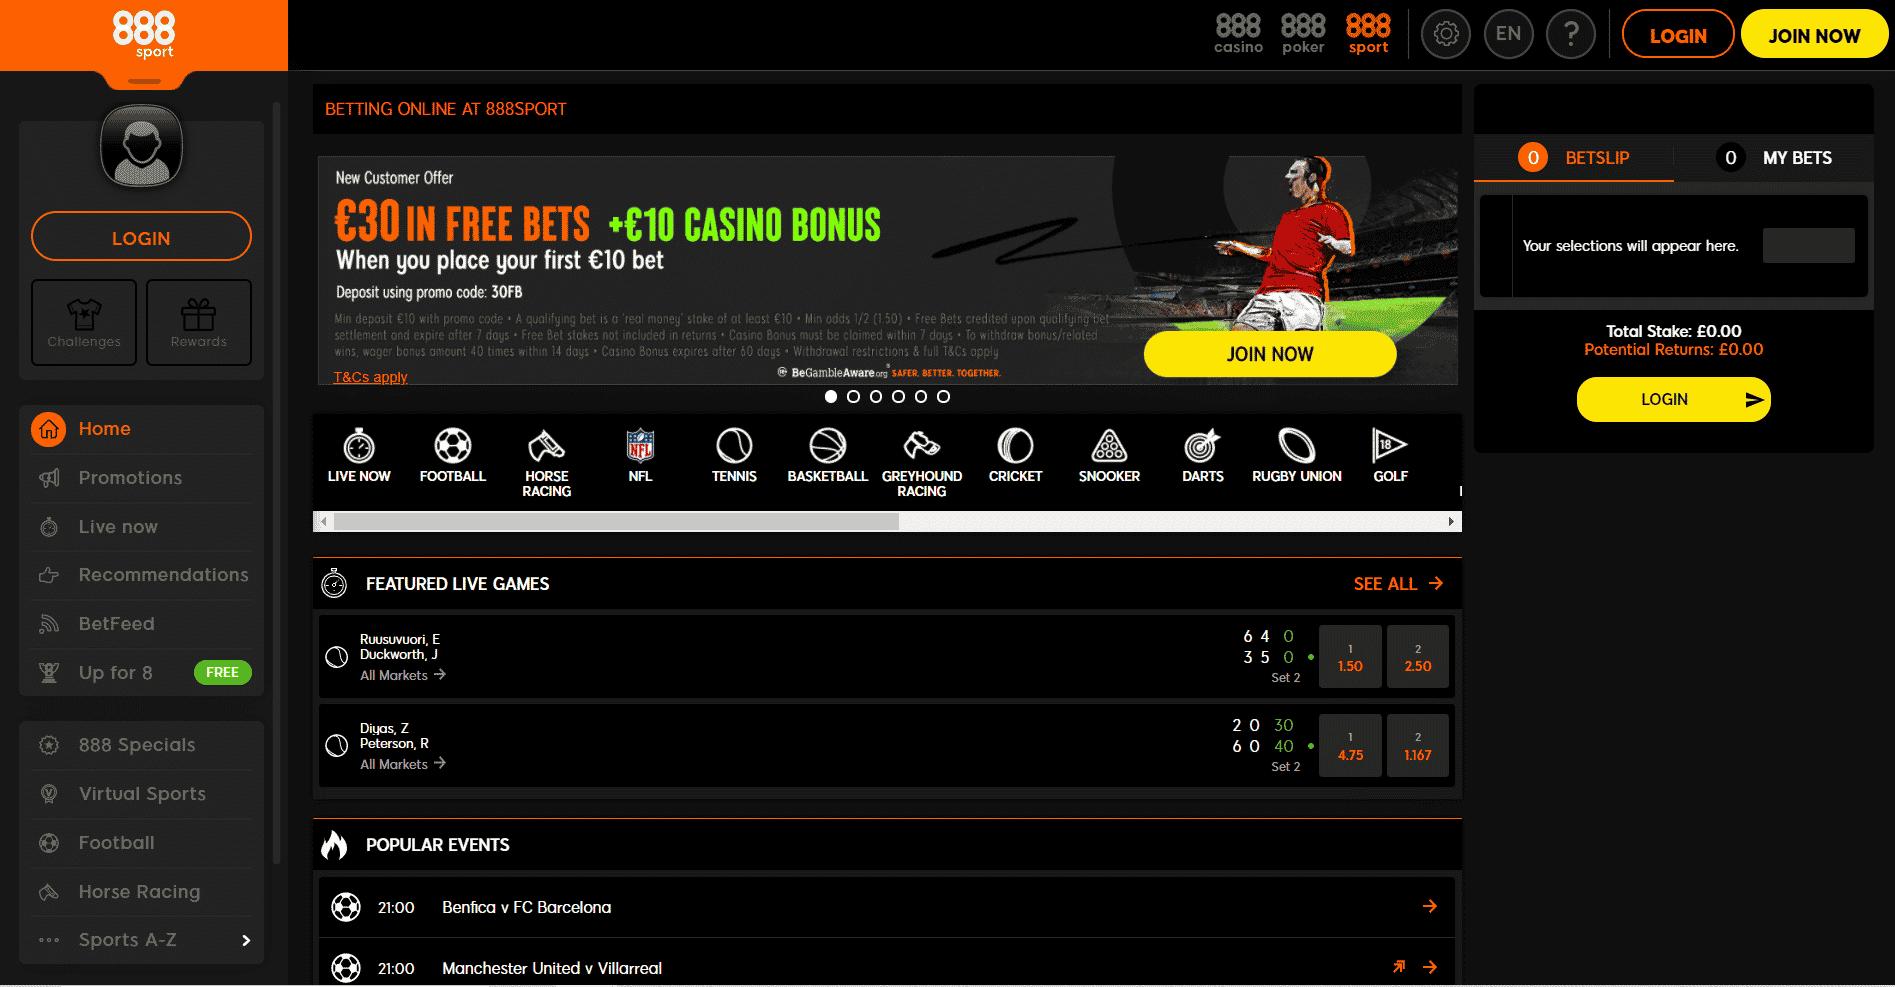 horse racing betting - 888sport